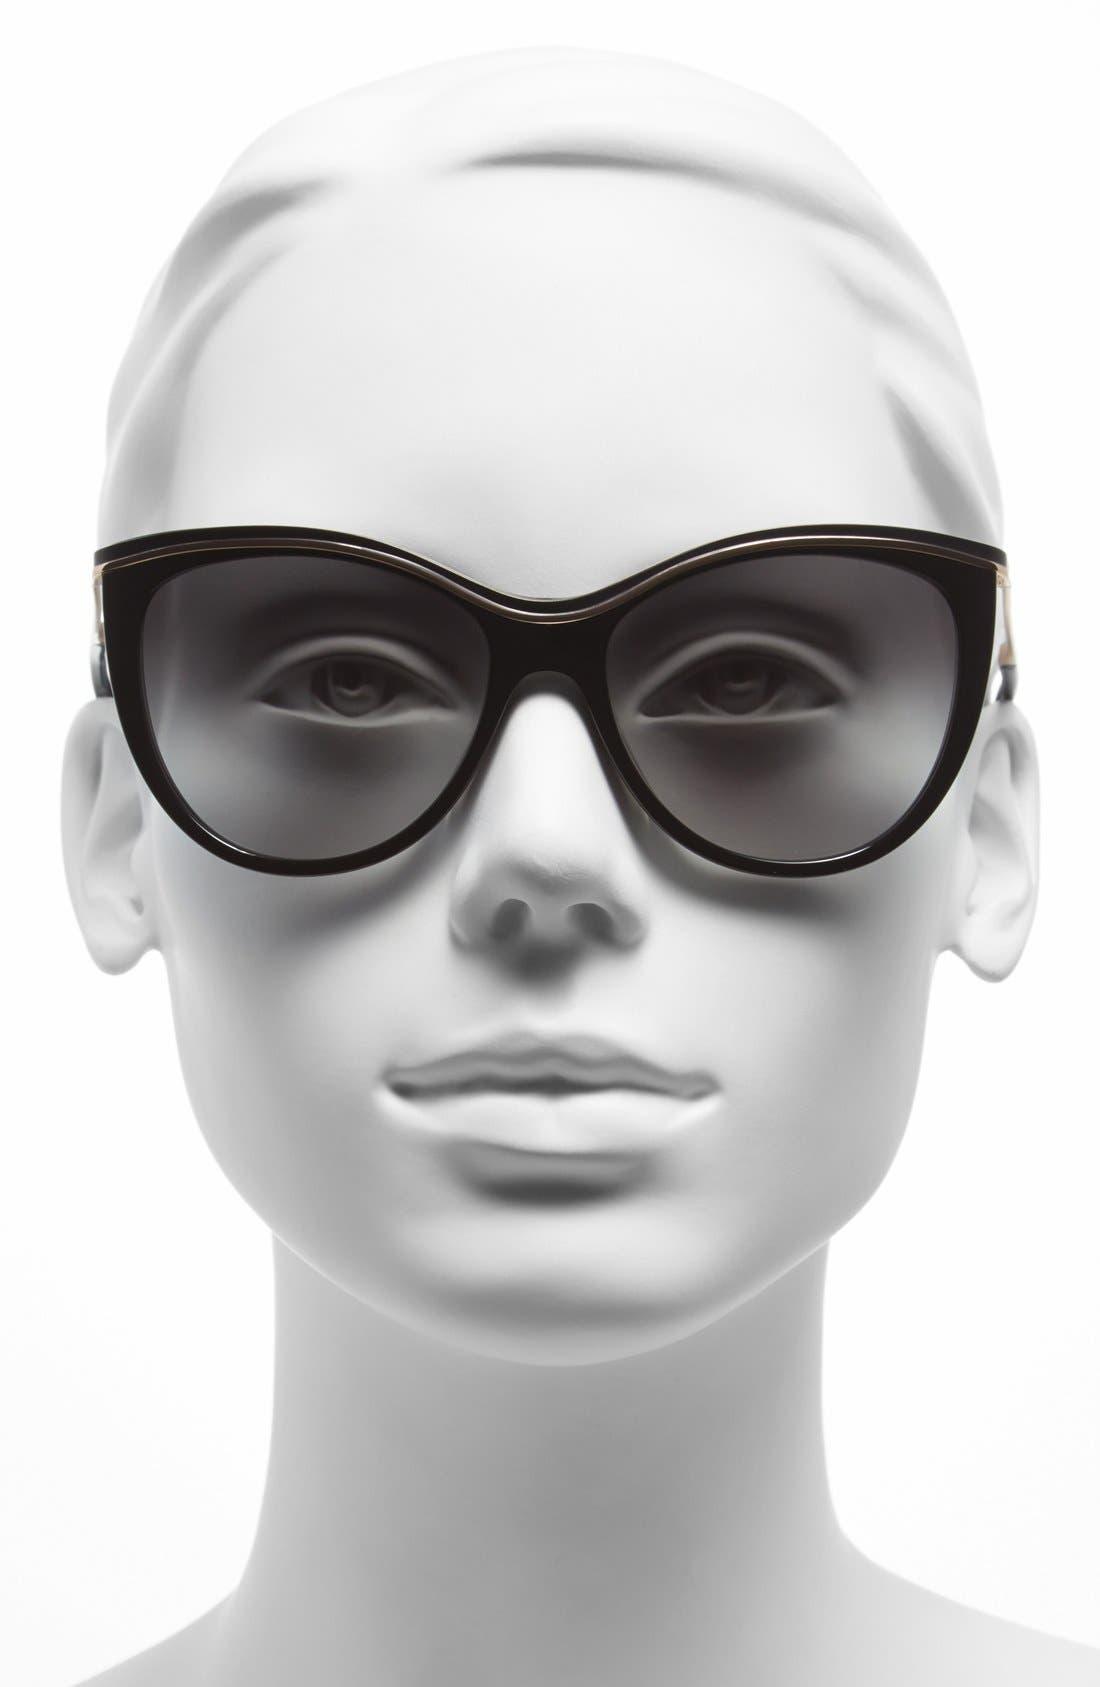 KATE SPADE NEW YORK,                             56mm cat eye sunglasses,                             Alternate thumbnail 2, color,                             001